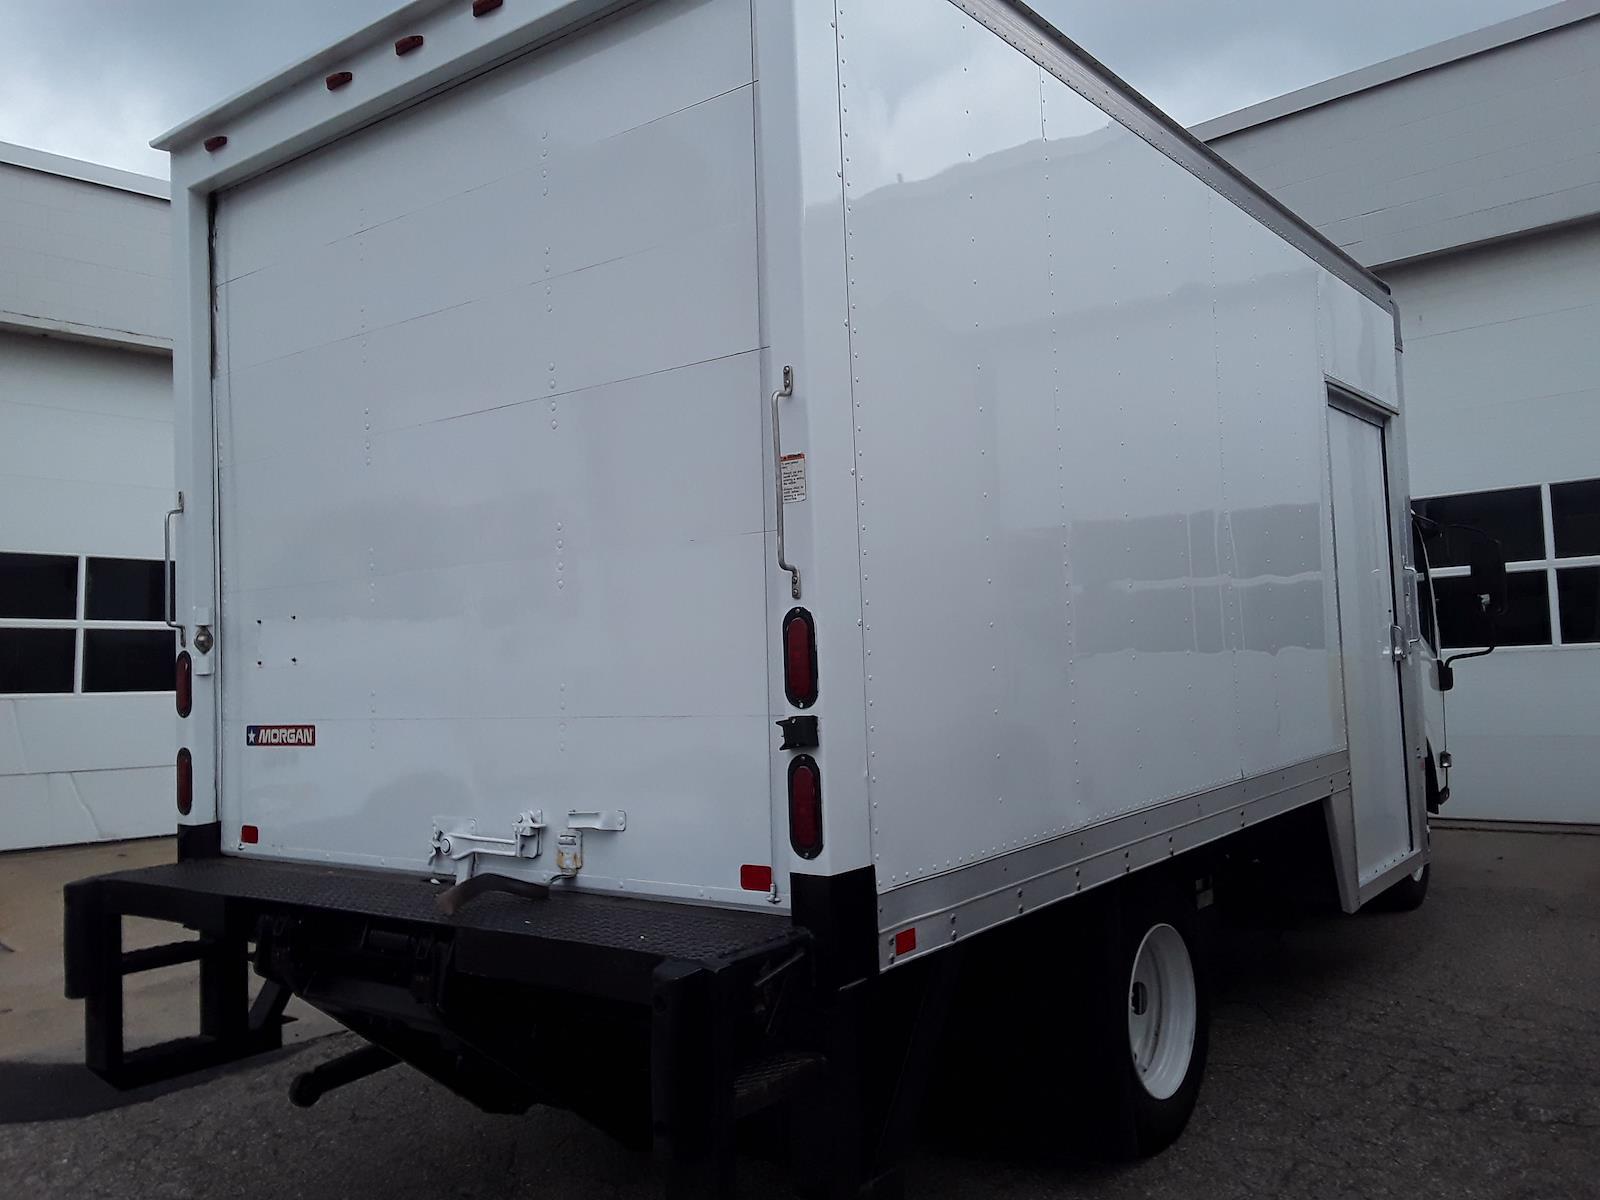 2013 Isuzu NPR-HD Regular Cab 4x2, Dry Freight #533697 - photo 1